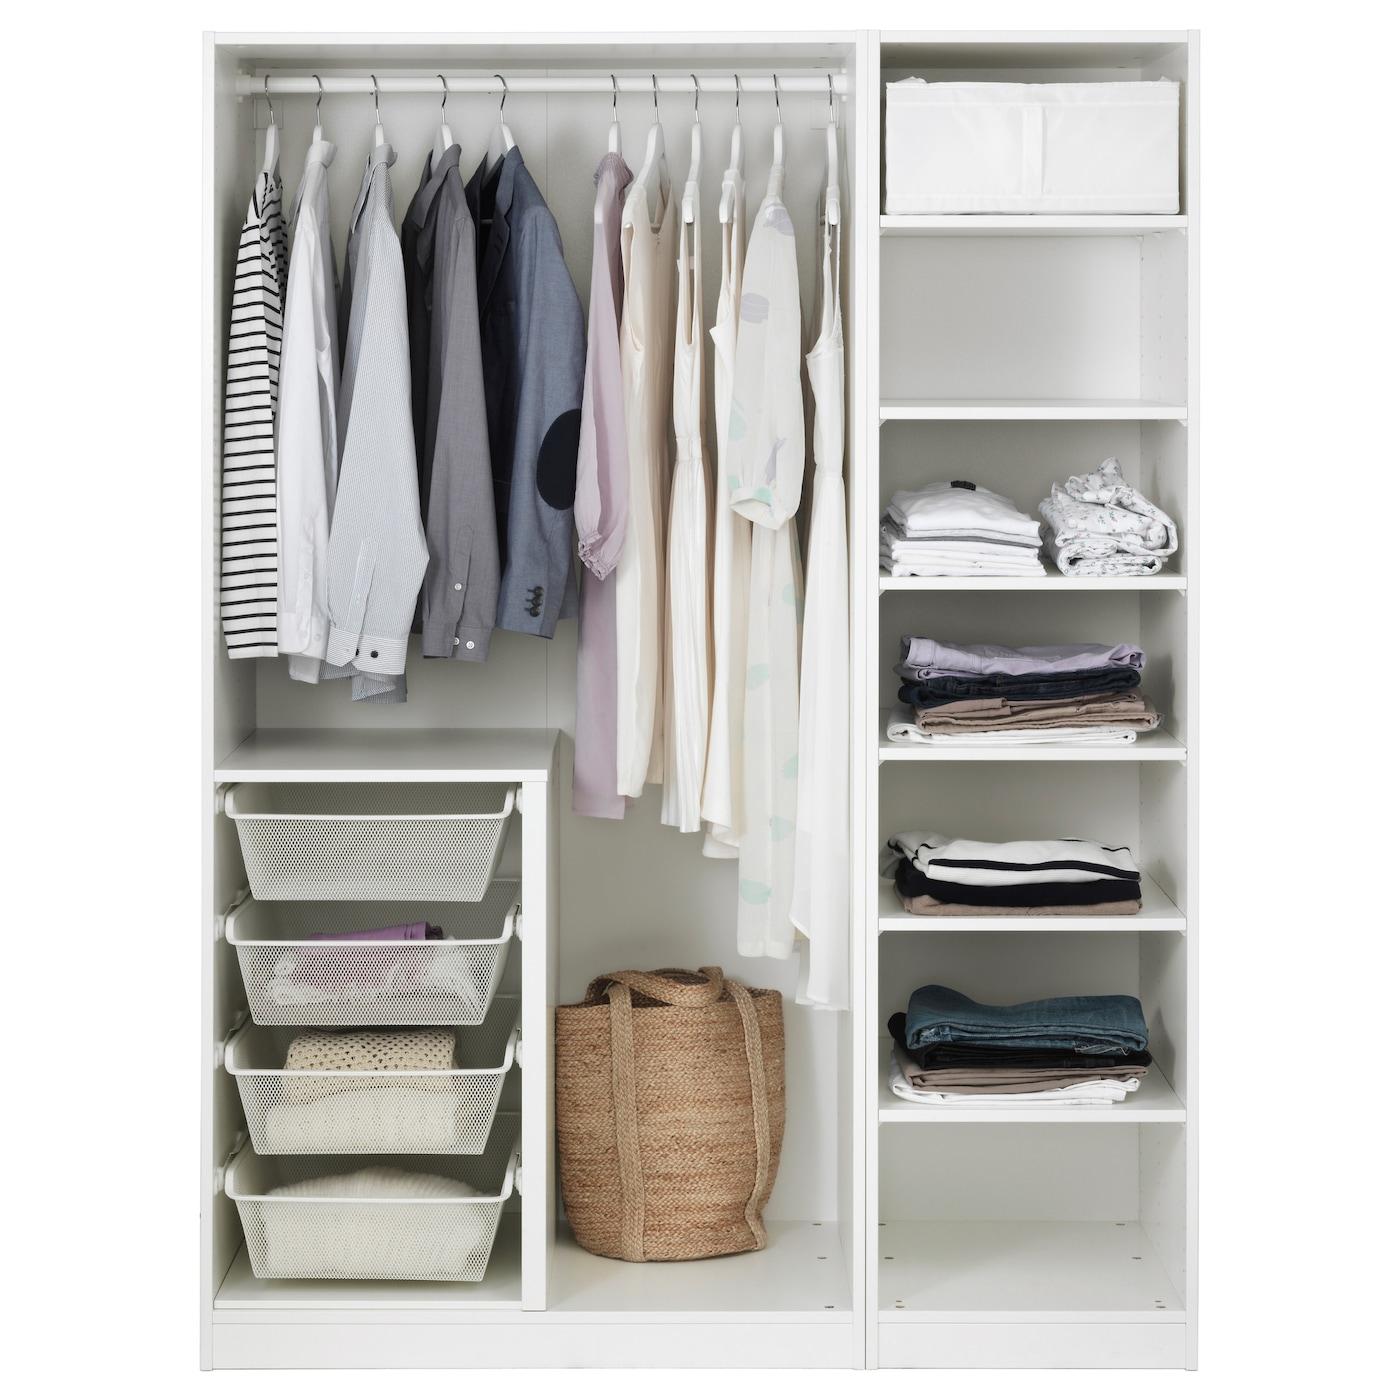 PAX Wardrobe Whitebergsbo White Xx Cm IKEA - Ikea wardrobe